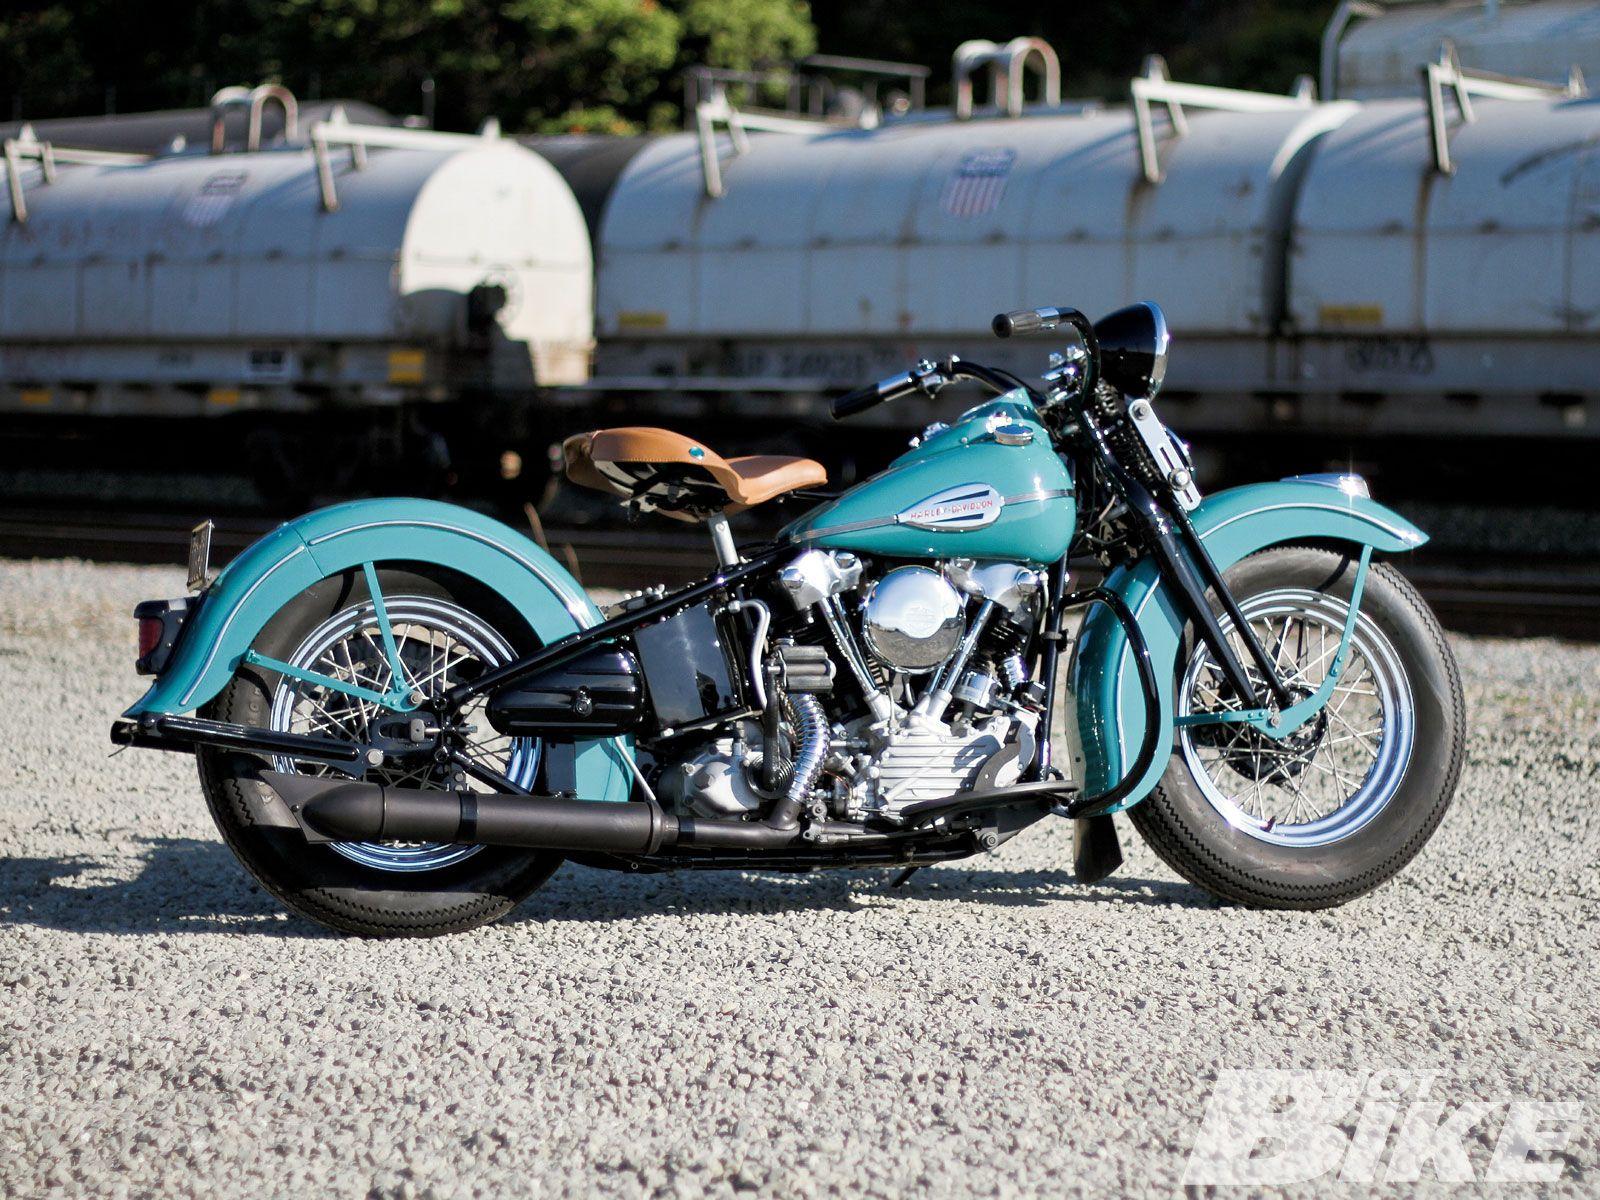 1941 Harley Davidson Knucklehead Rare Motorcycle Harley Harley Davidson Knucklehead Vintage Harley Davidson Motorcycles